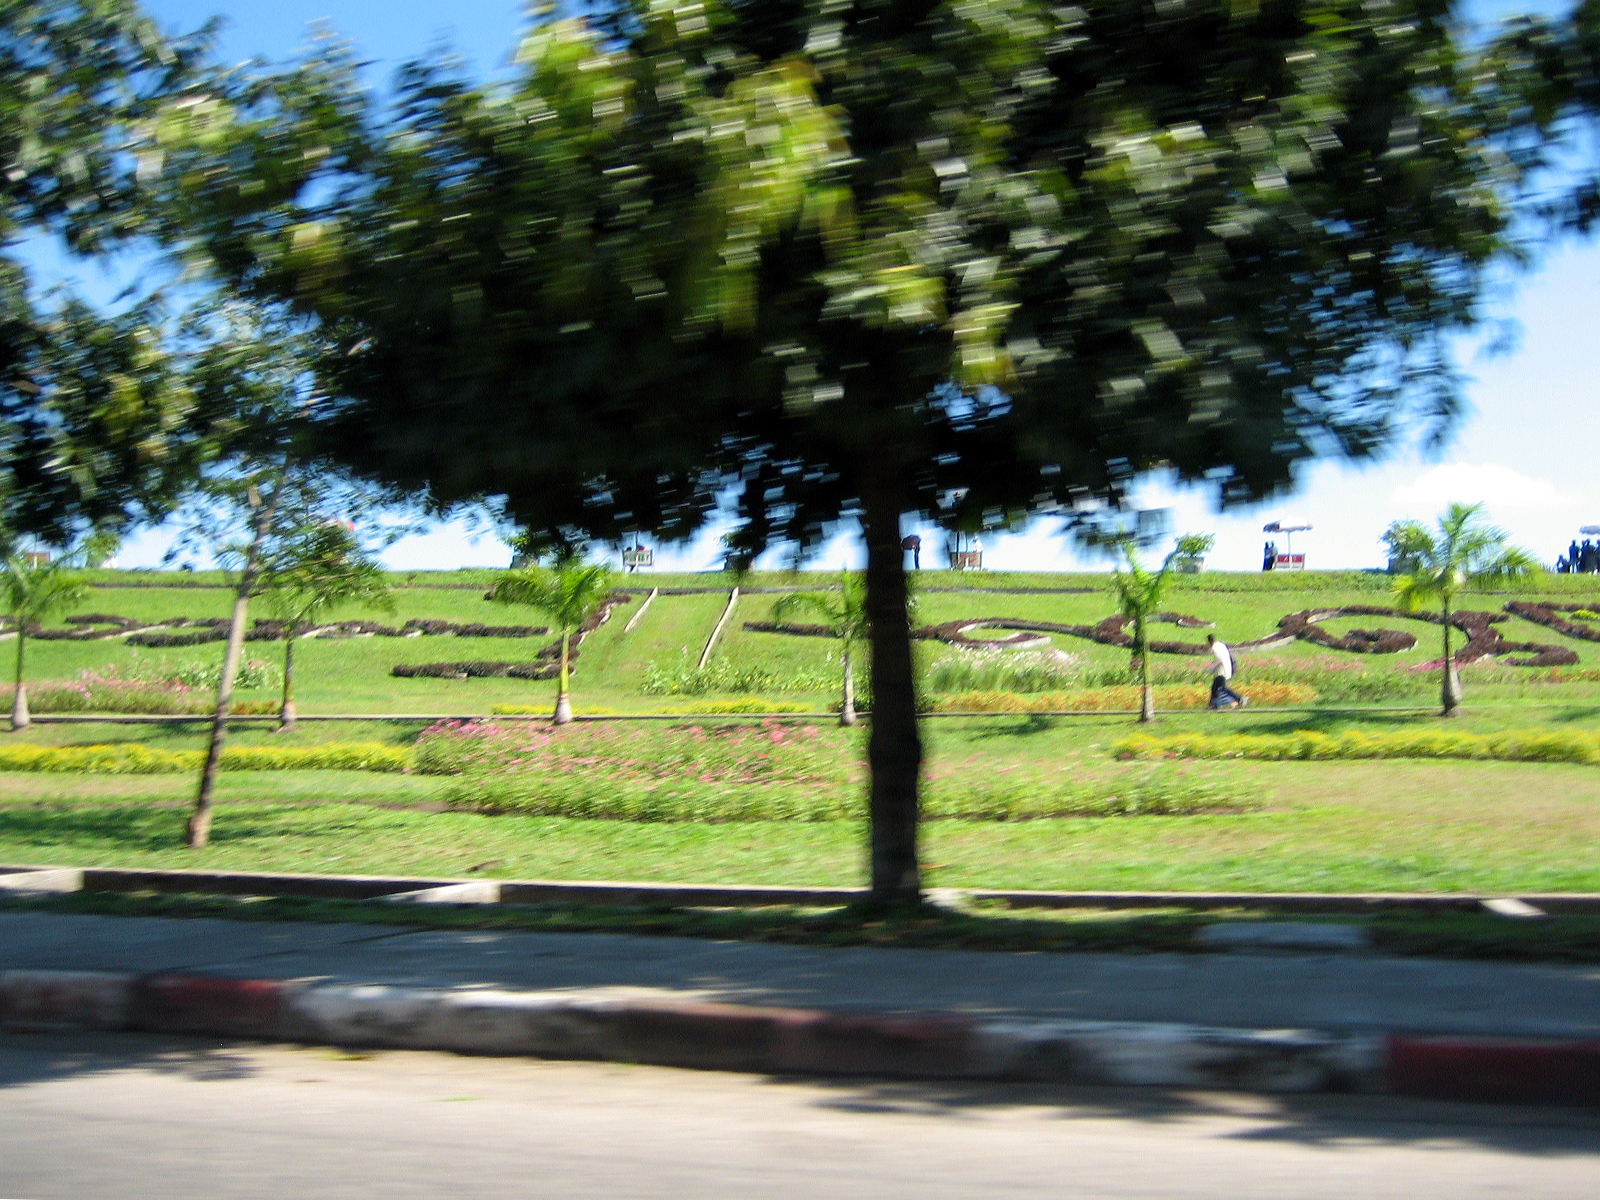 File:Inya Lake park grounds, Yangon.jpg - Wikimedia Commons